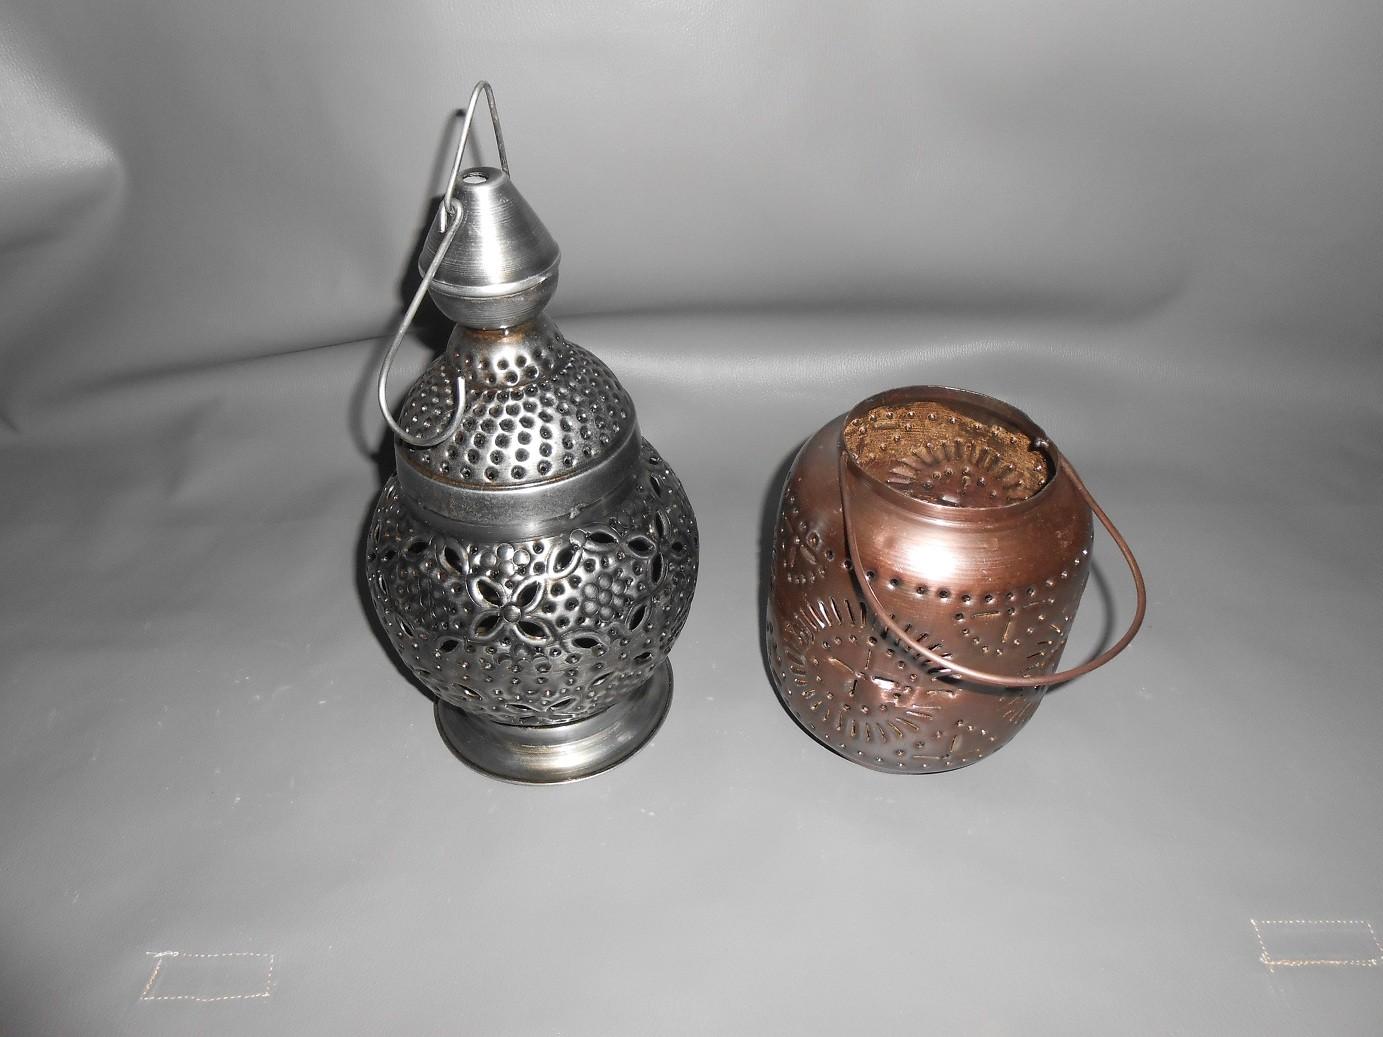 Antique Copper Lanterns-Small Size